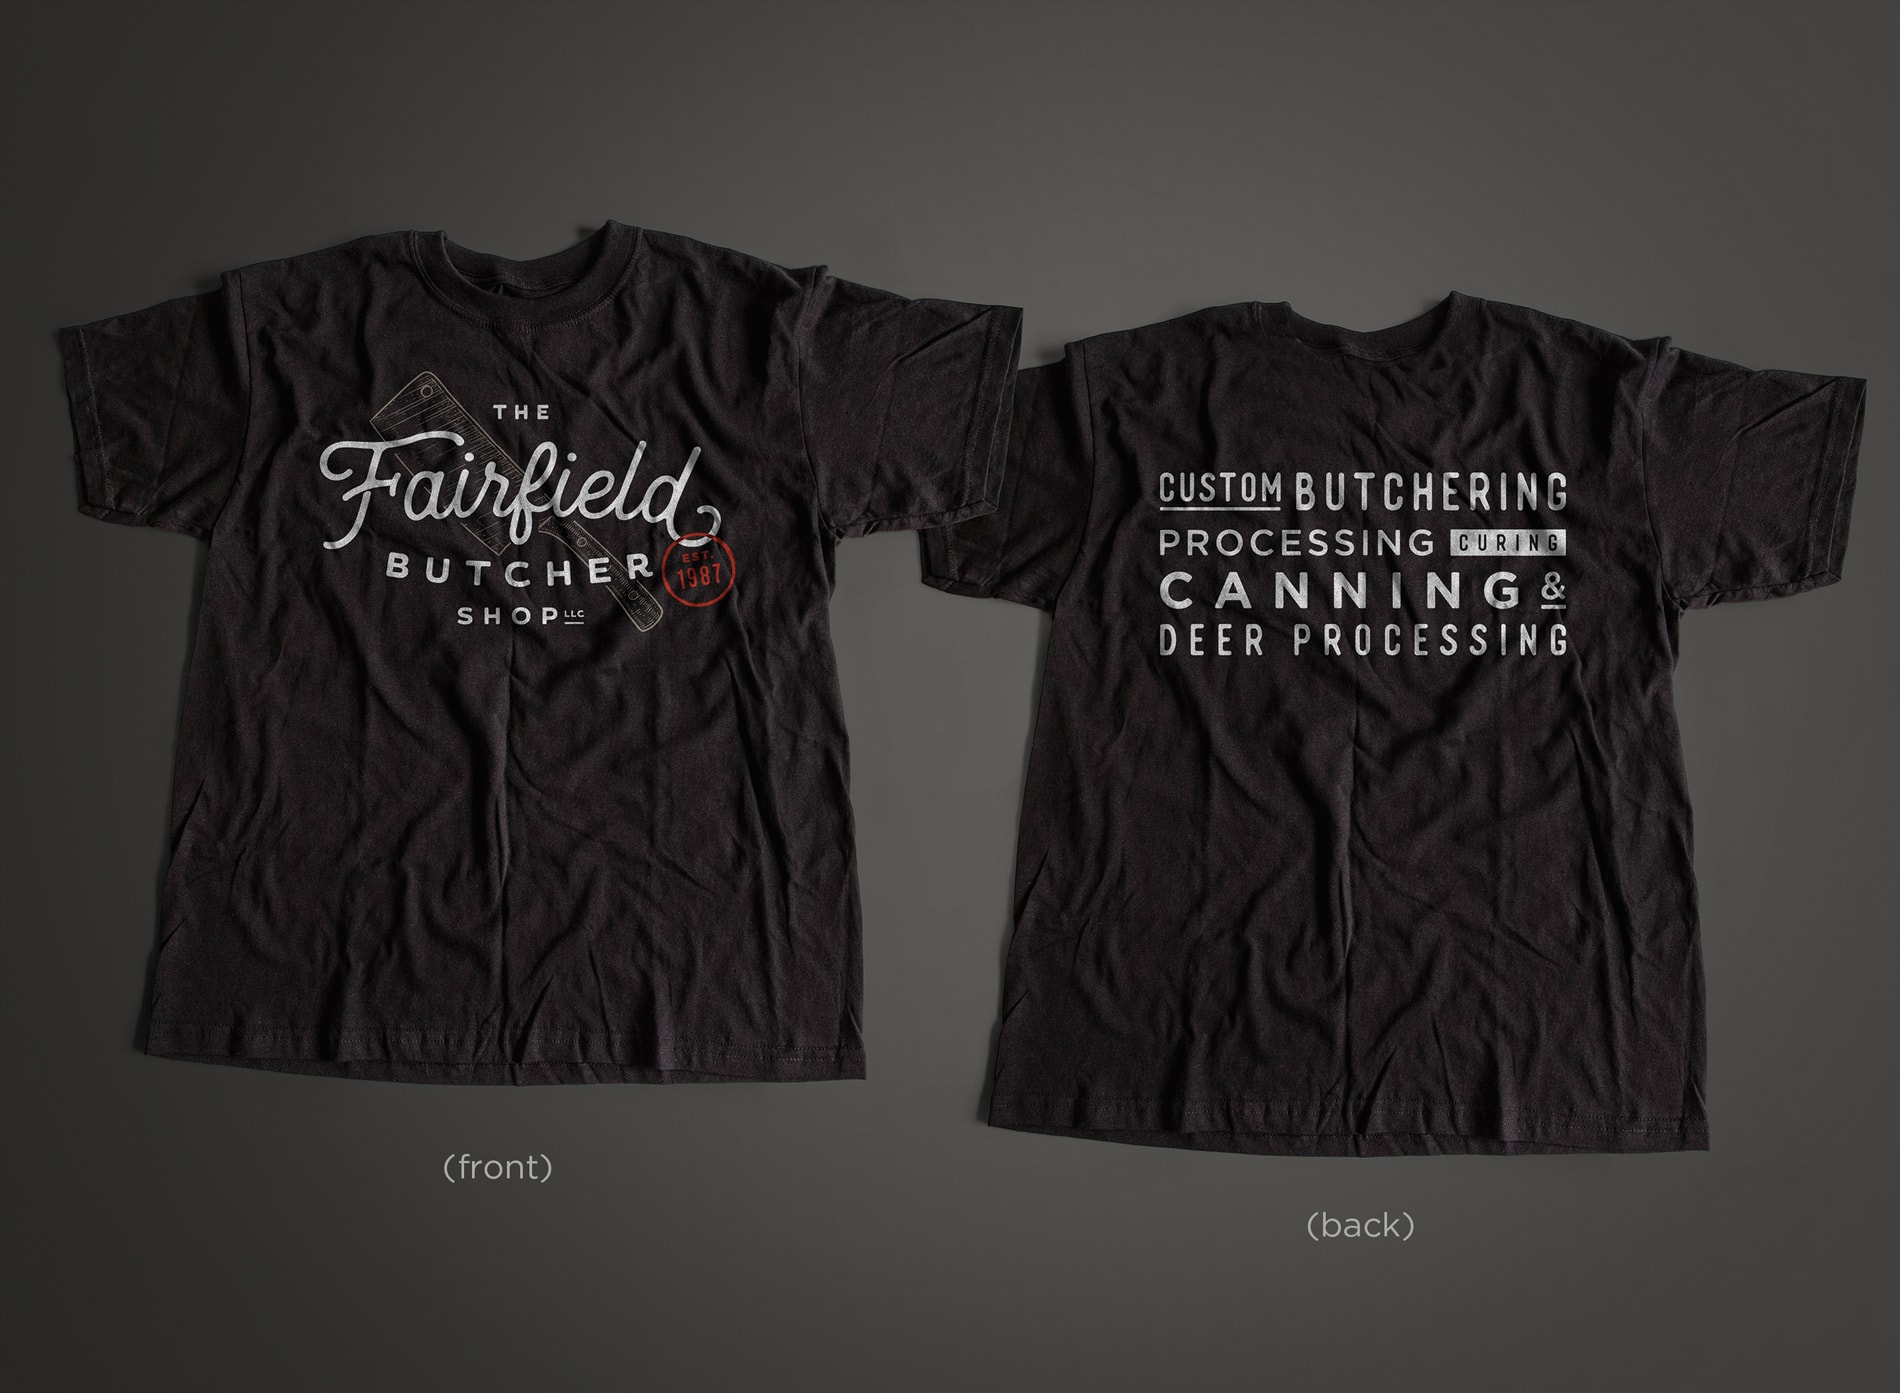 Fairfield_Tshirt_Design-min.jpg